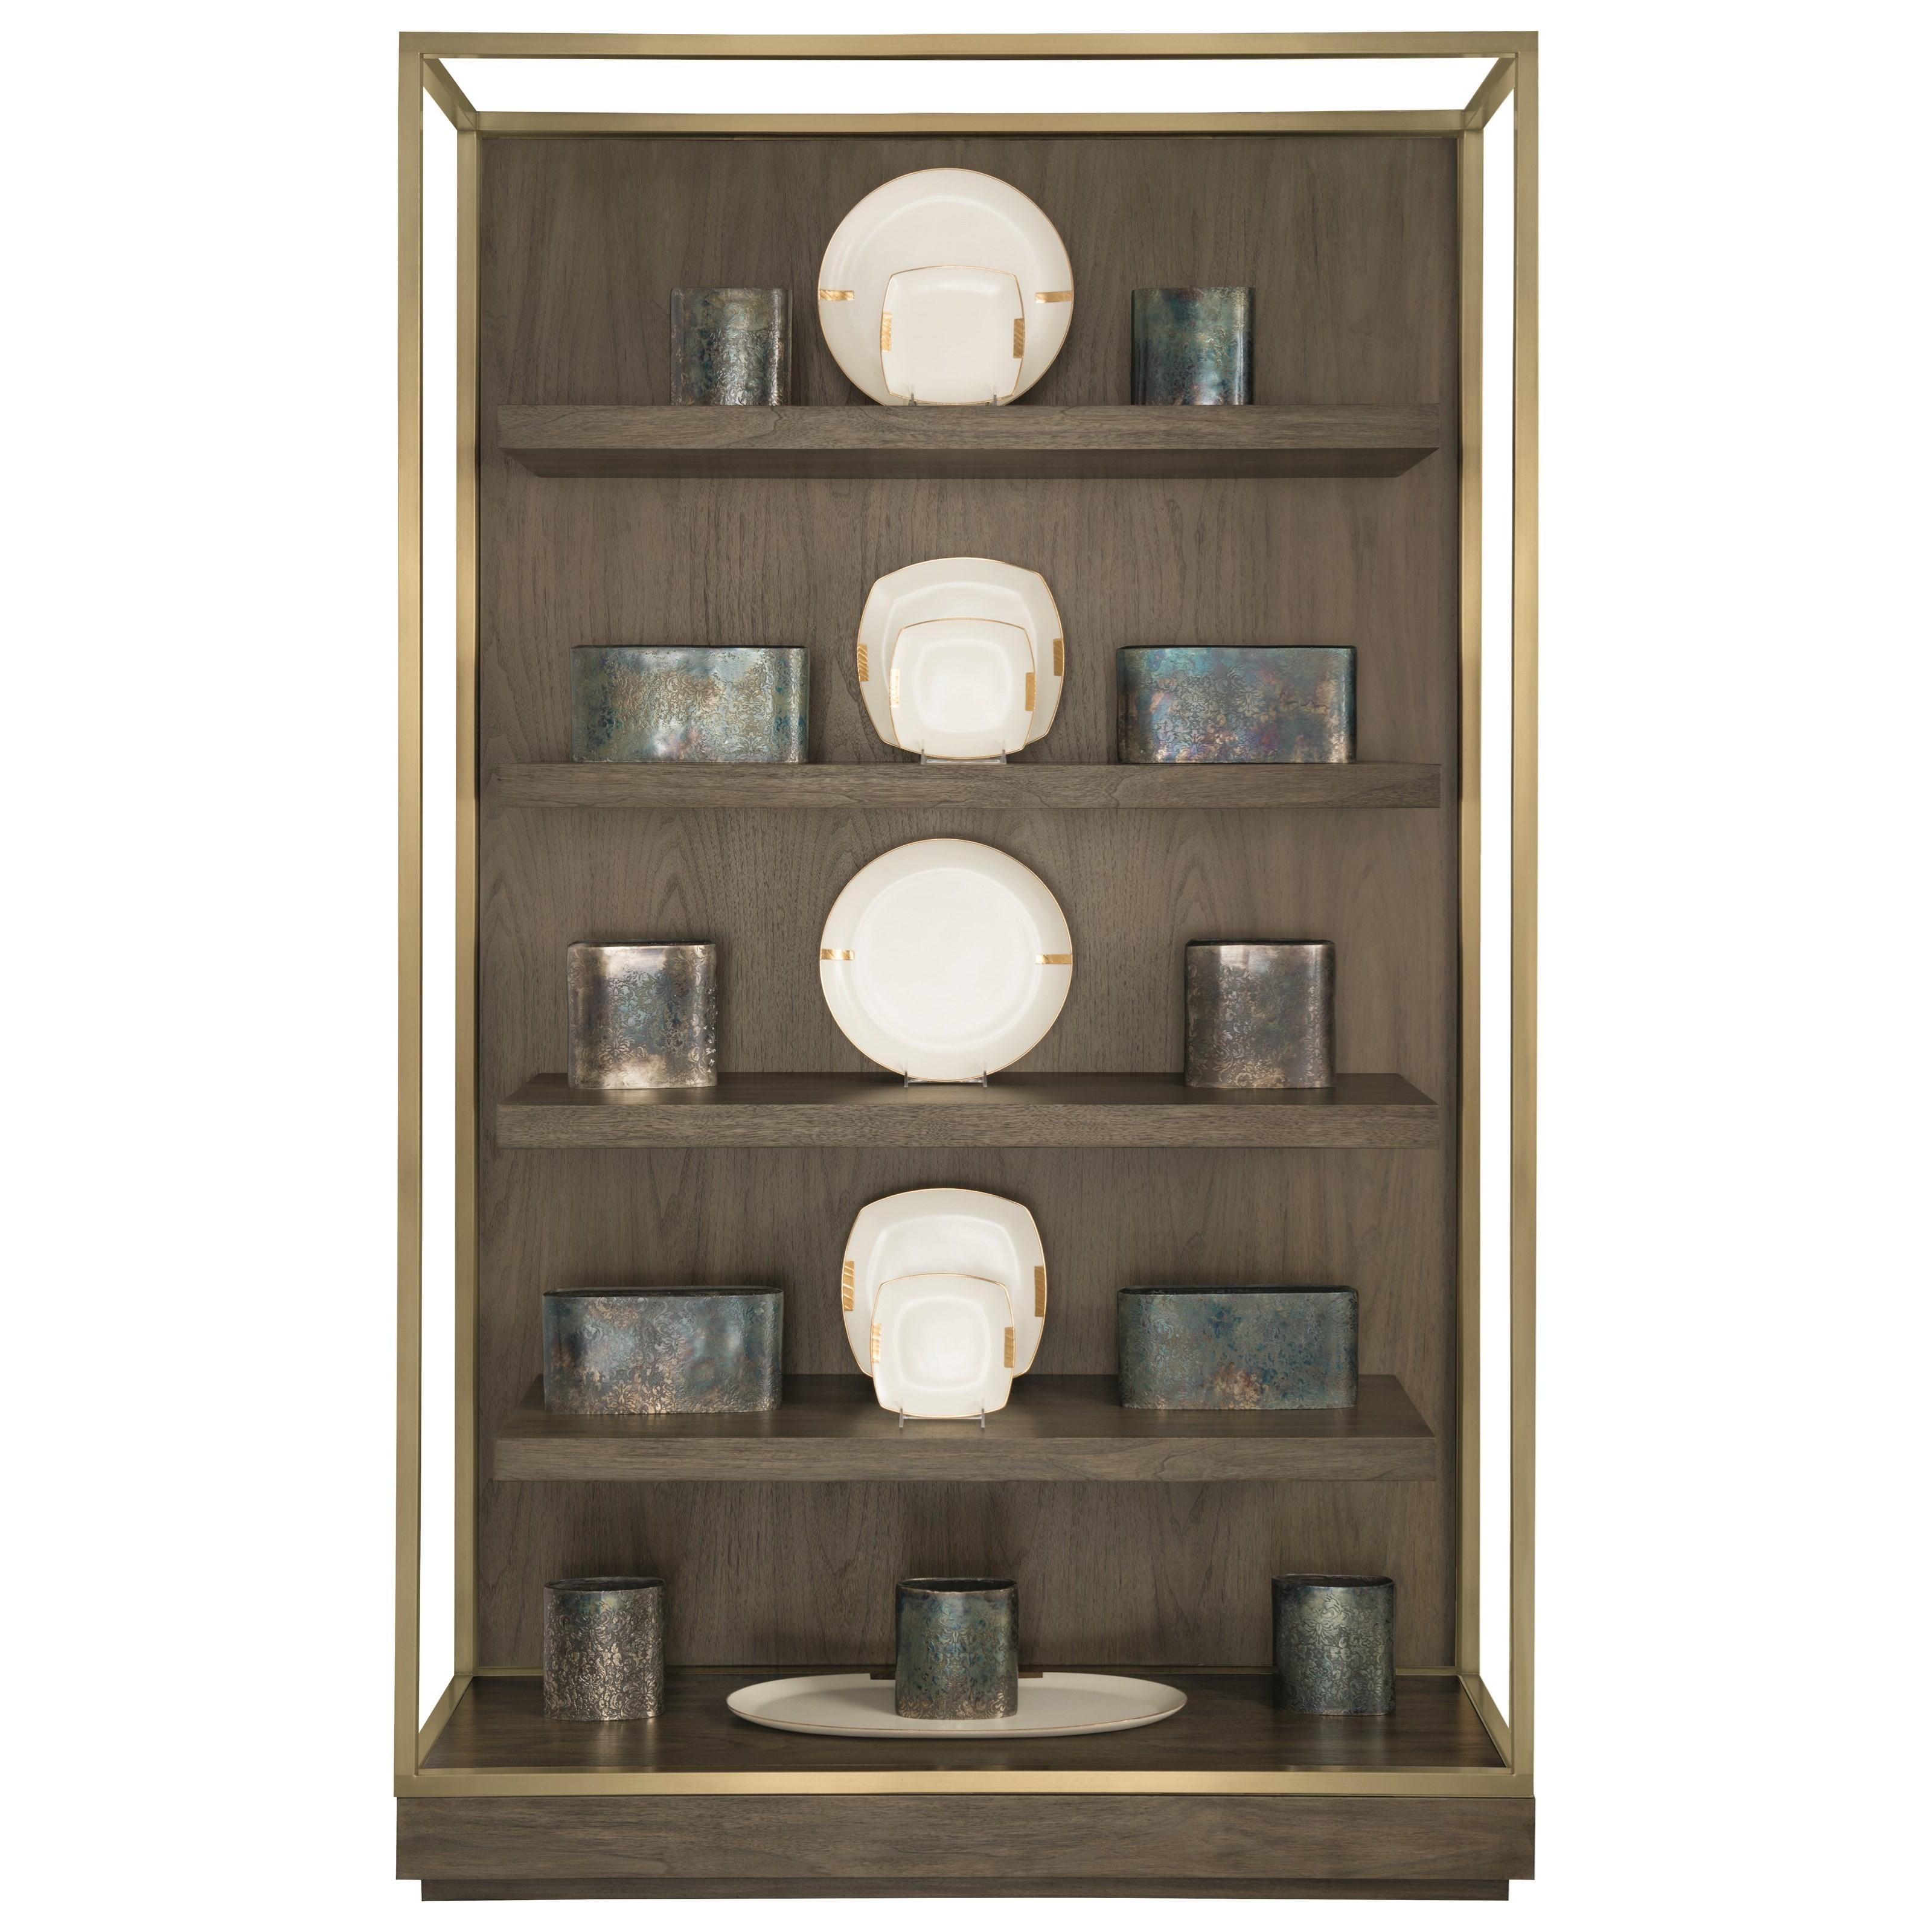 Bernhardt Profile Etagere with Floating Shelves - Item Number: 378-812